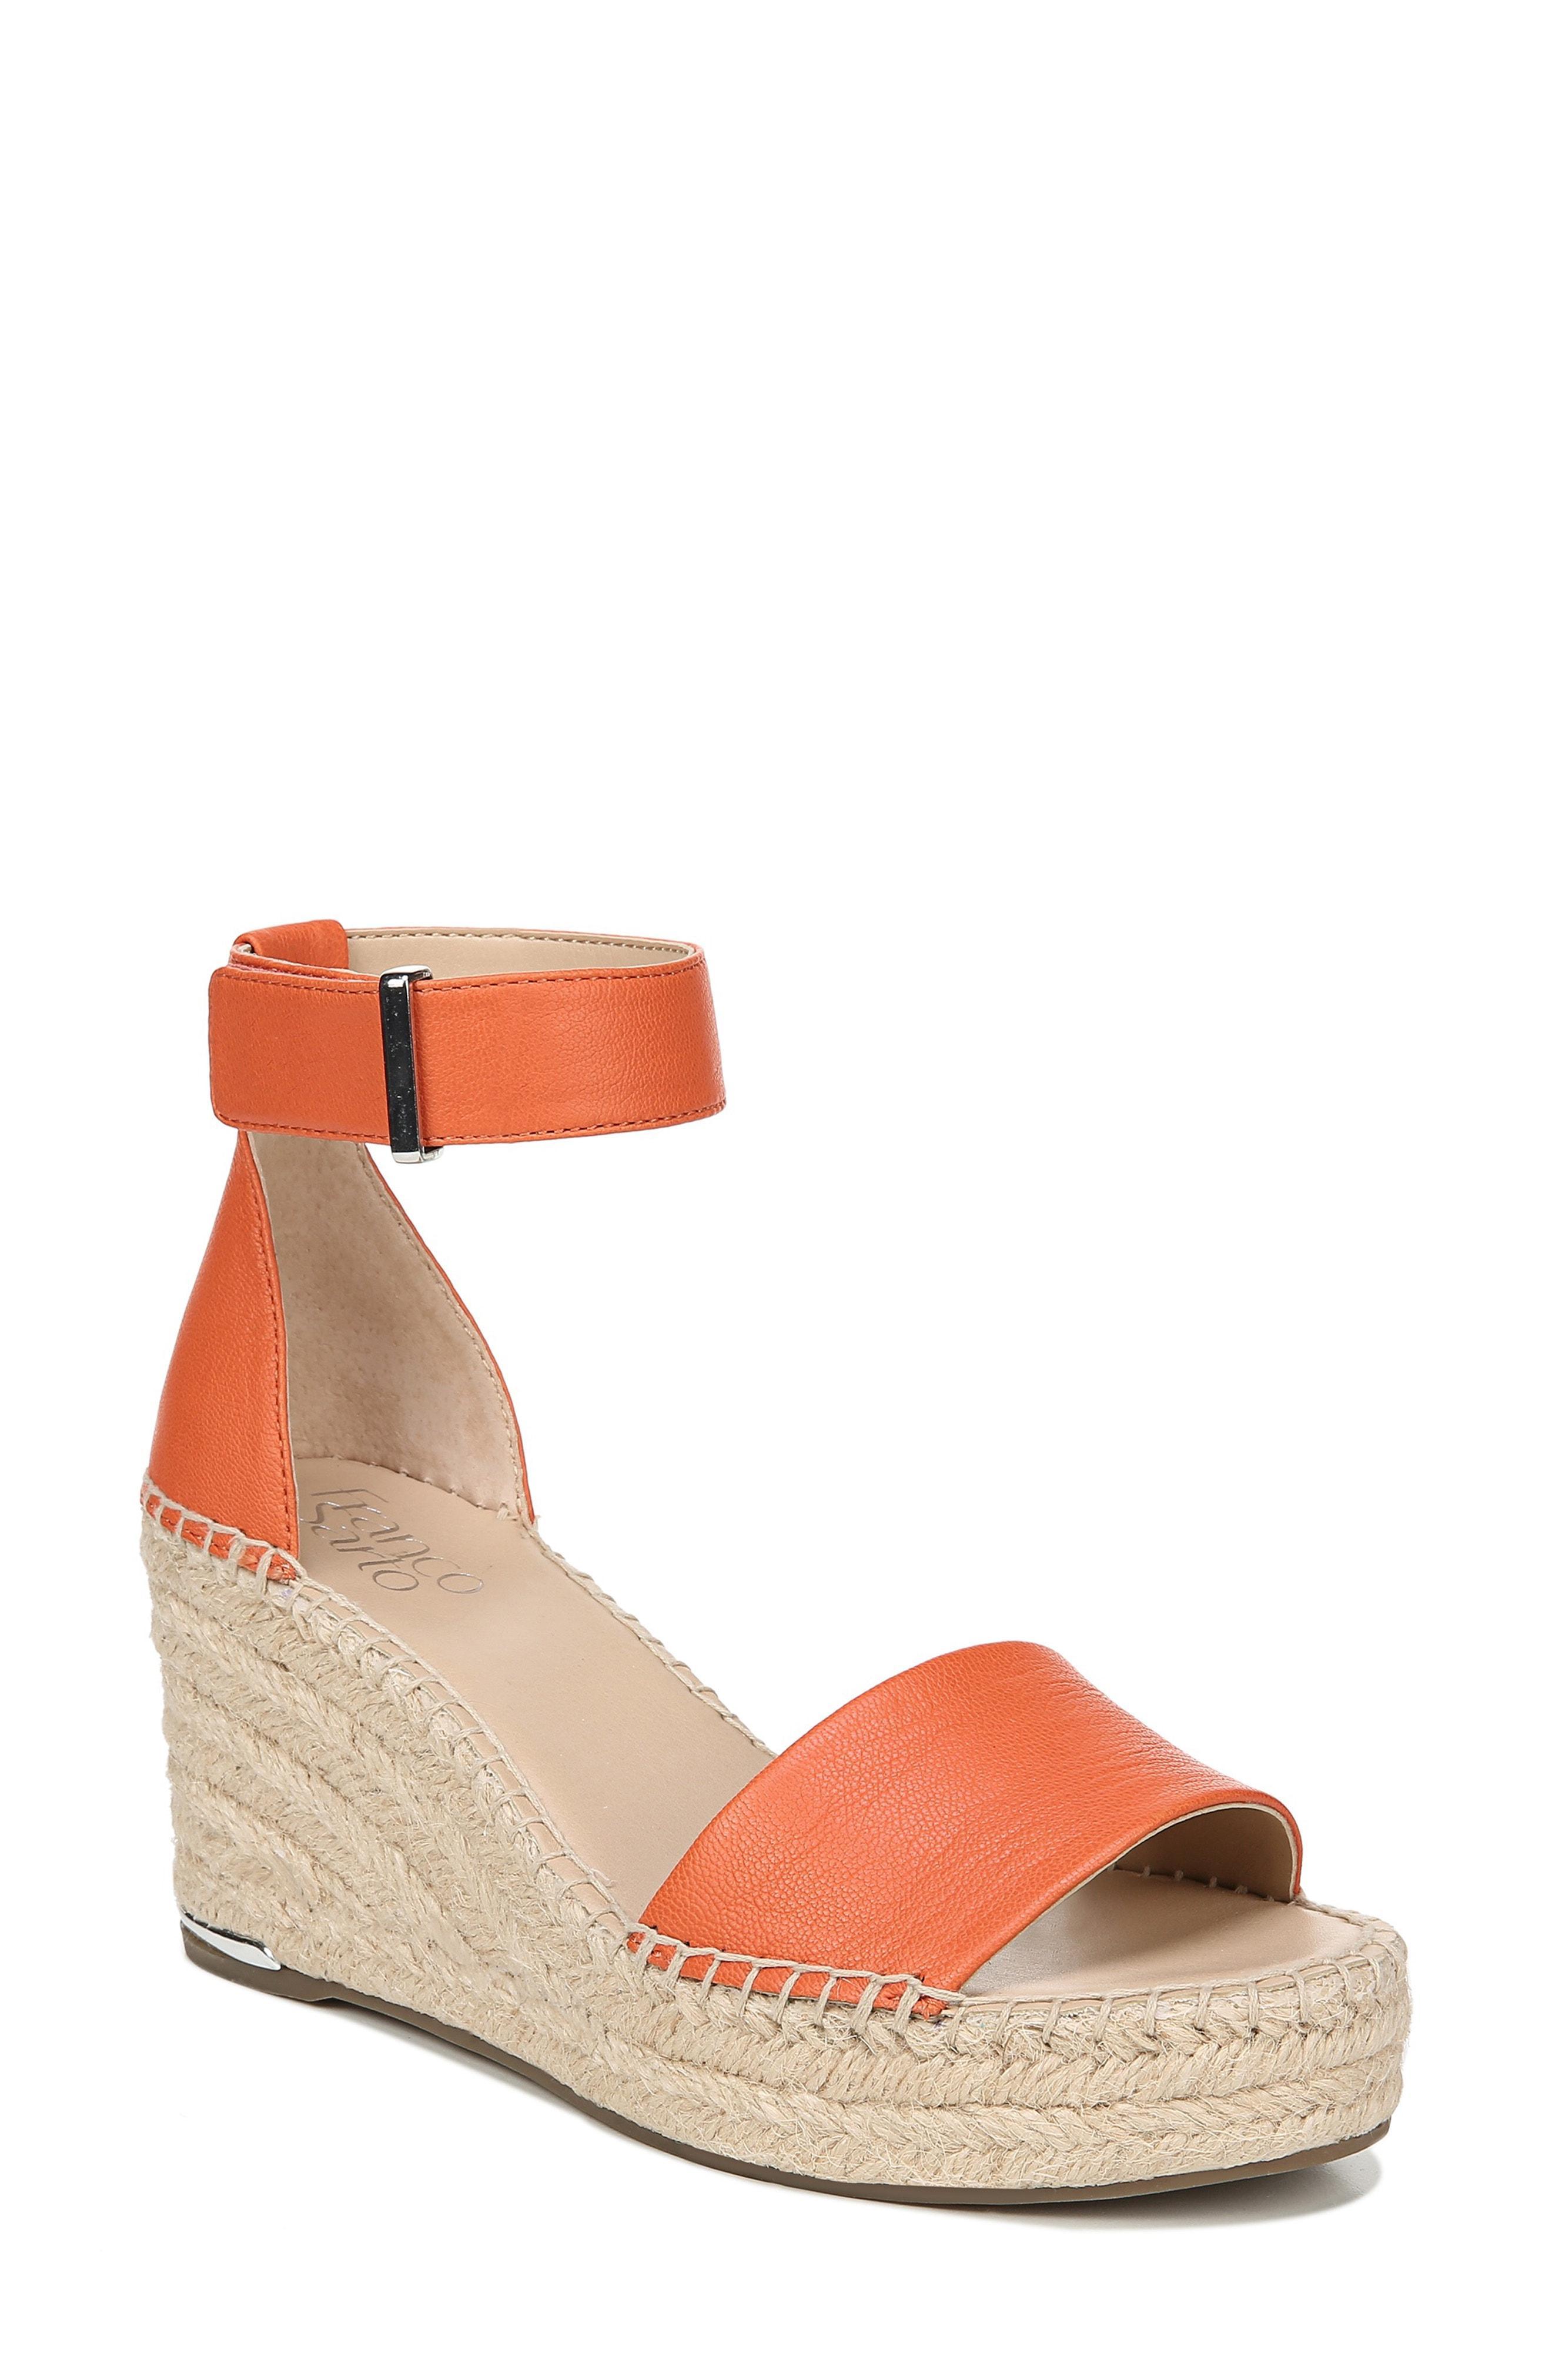 6e22526291d Lyst - Franco Sarto Clemens Espadrille Wedge Sandal in Orange - Save 1%